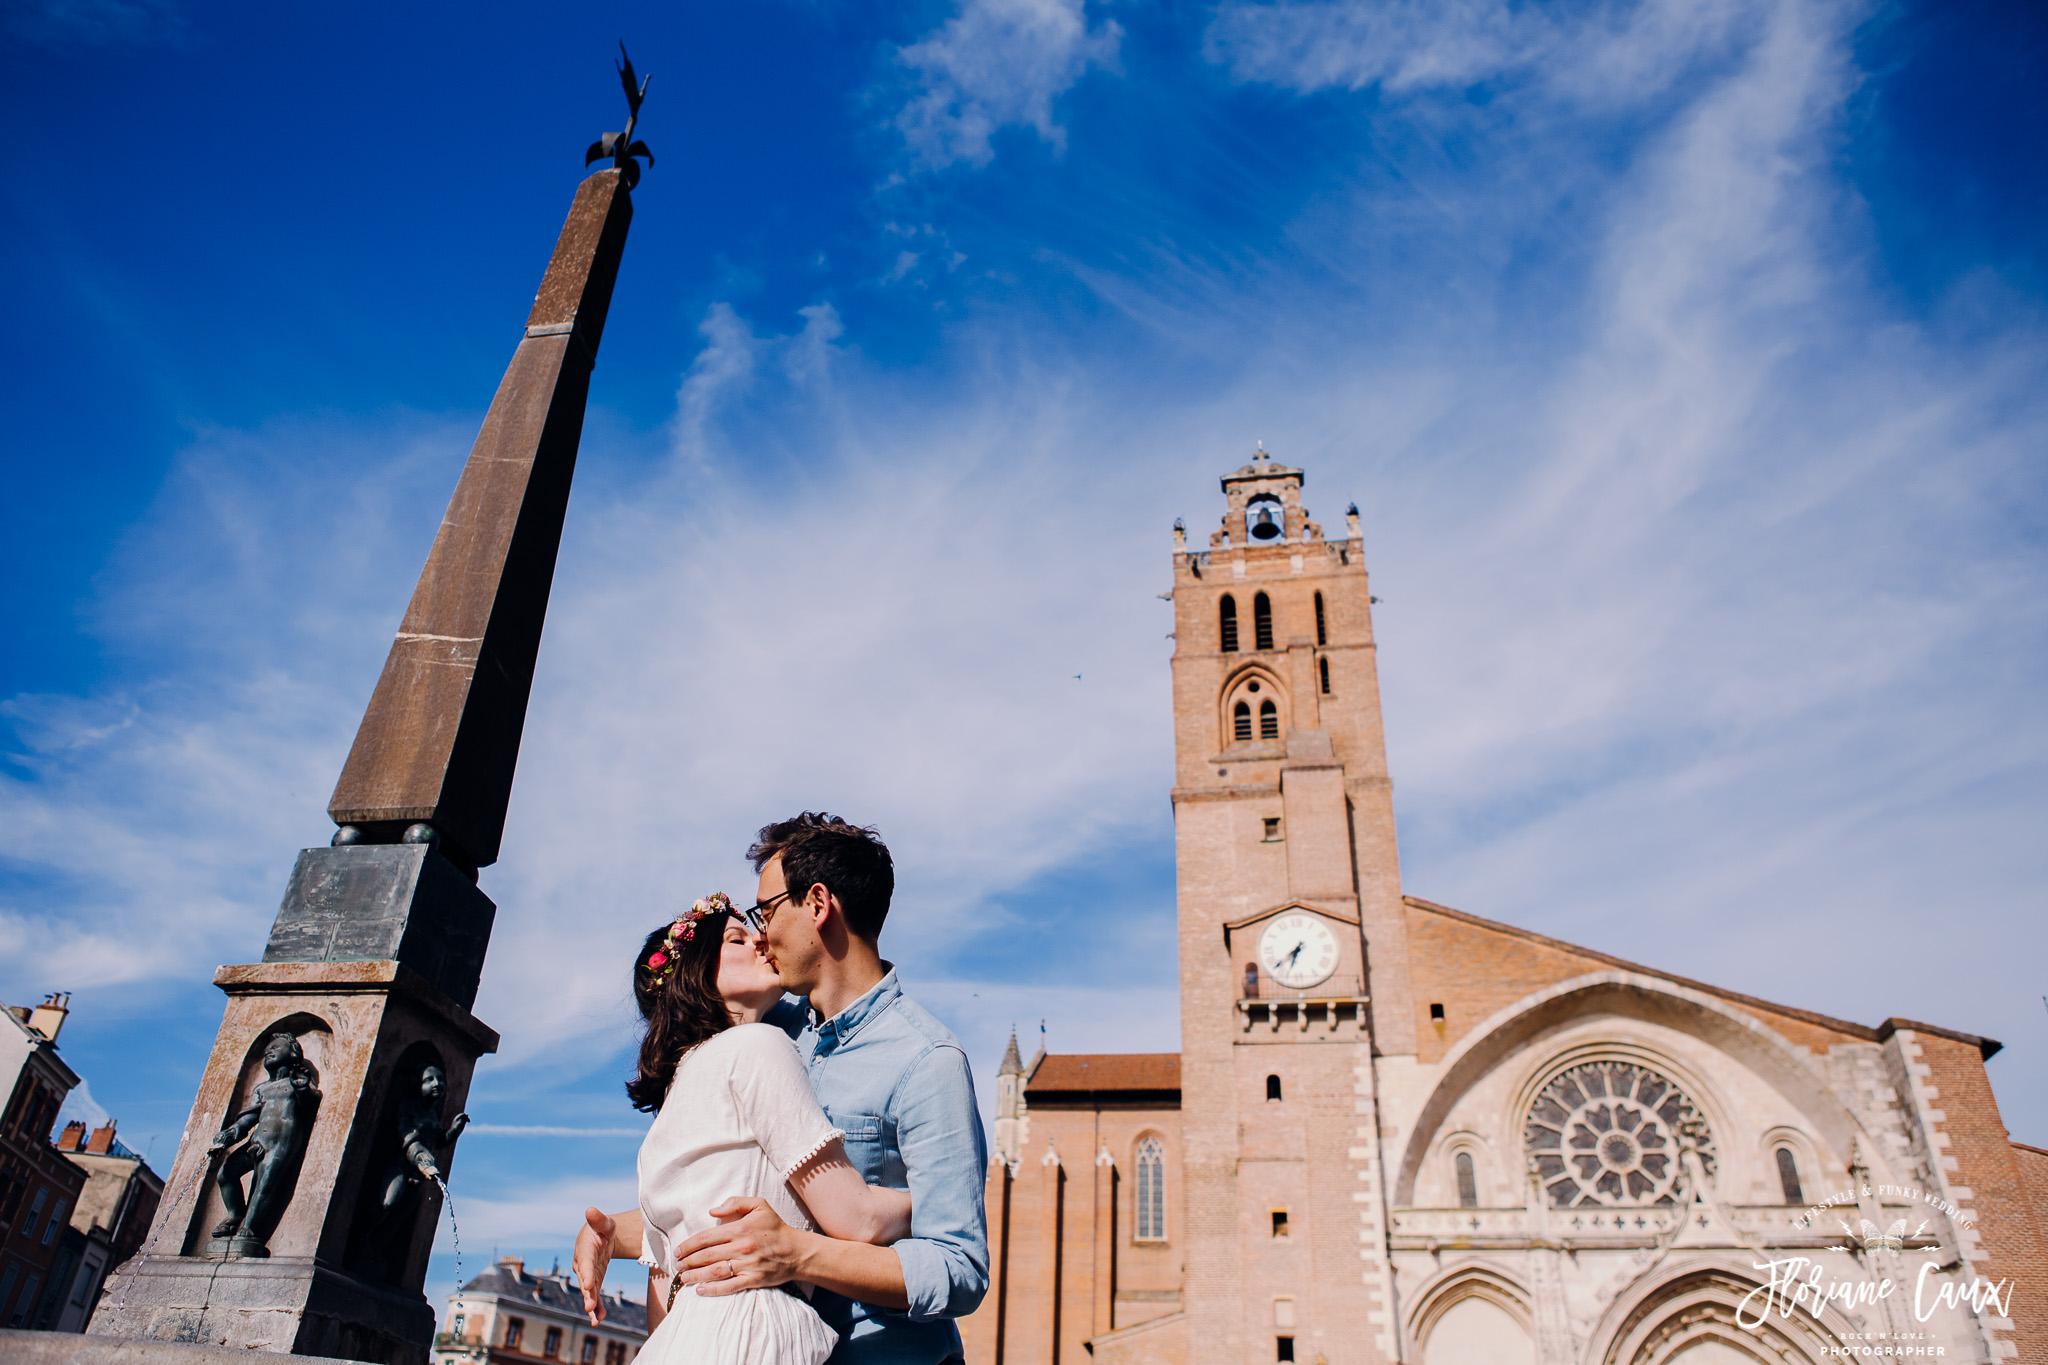 seance-engagement-toulouse-photographe-mariage-floriane-caux-21